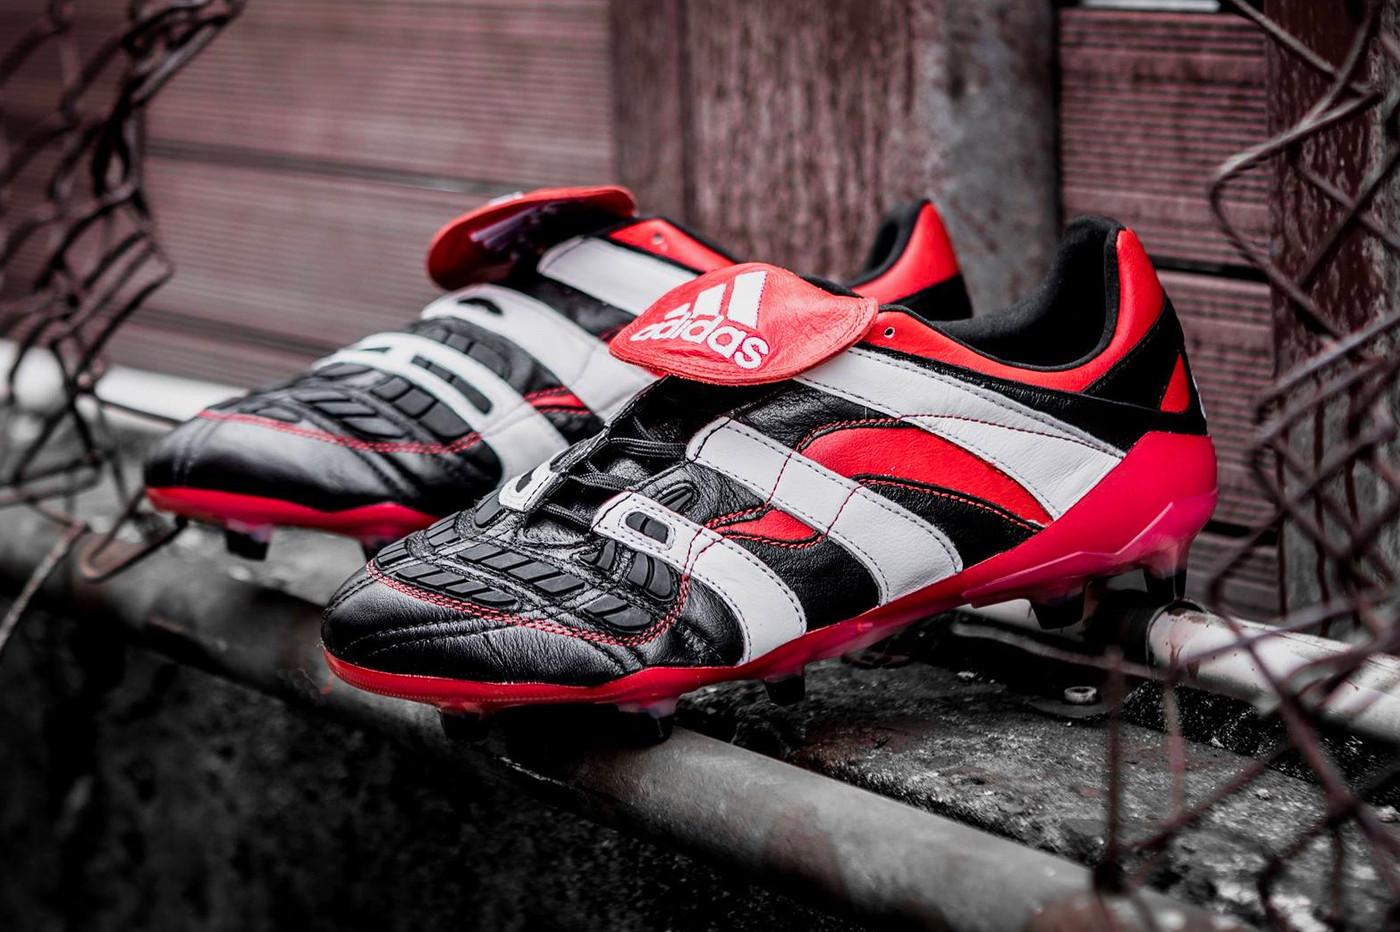 adidas-predator-accelerator-core-black-sneaker-cleat-release-3